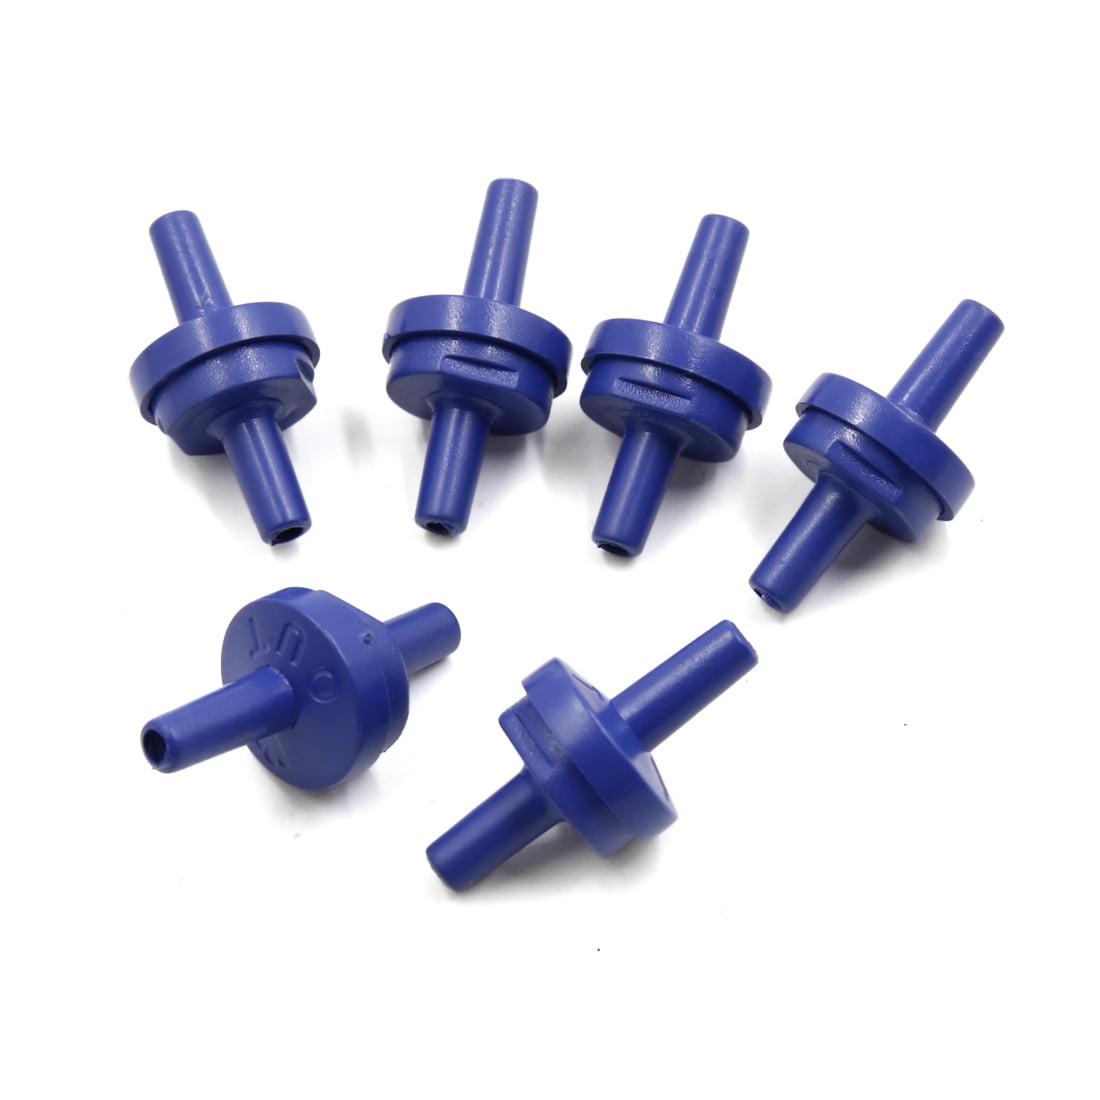 6pcs Blue Plastic One Way Check Valve Aquarium Air Pump Accessories Set